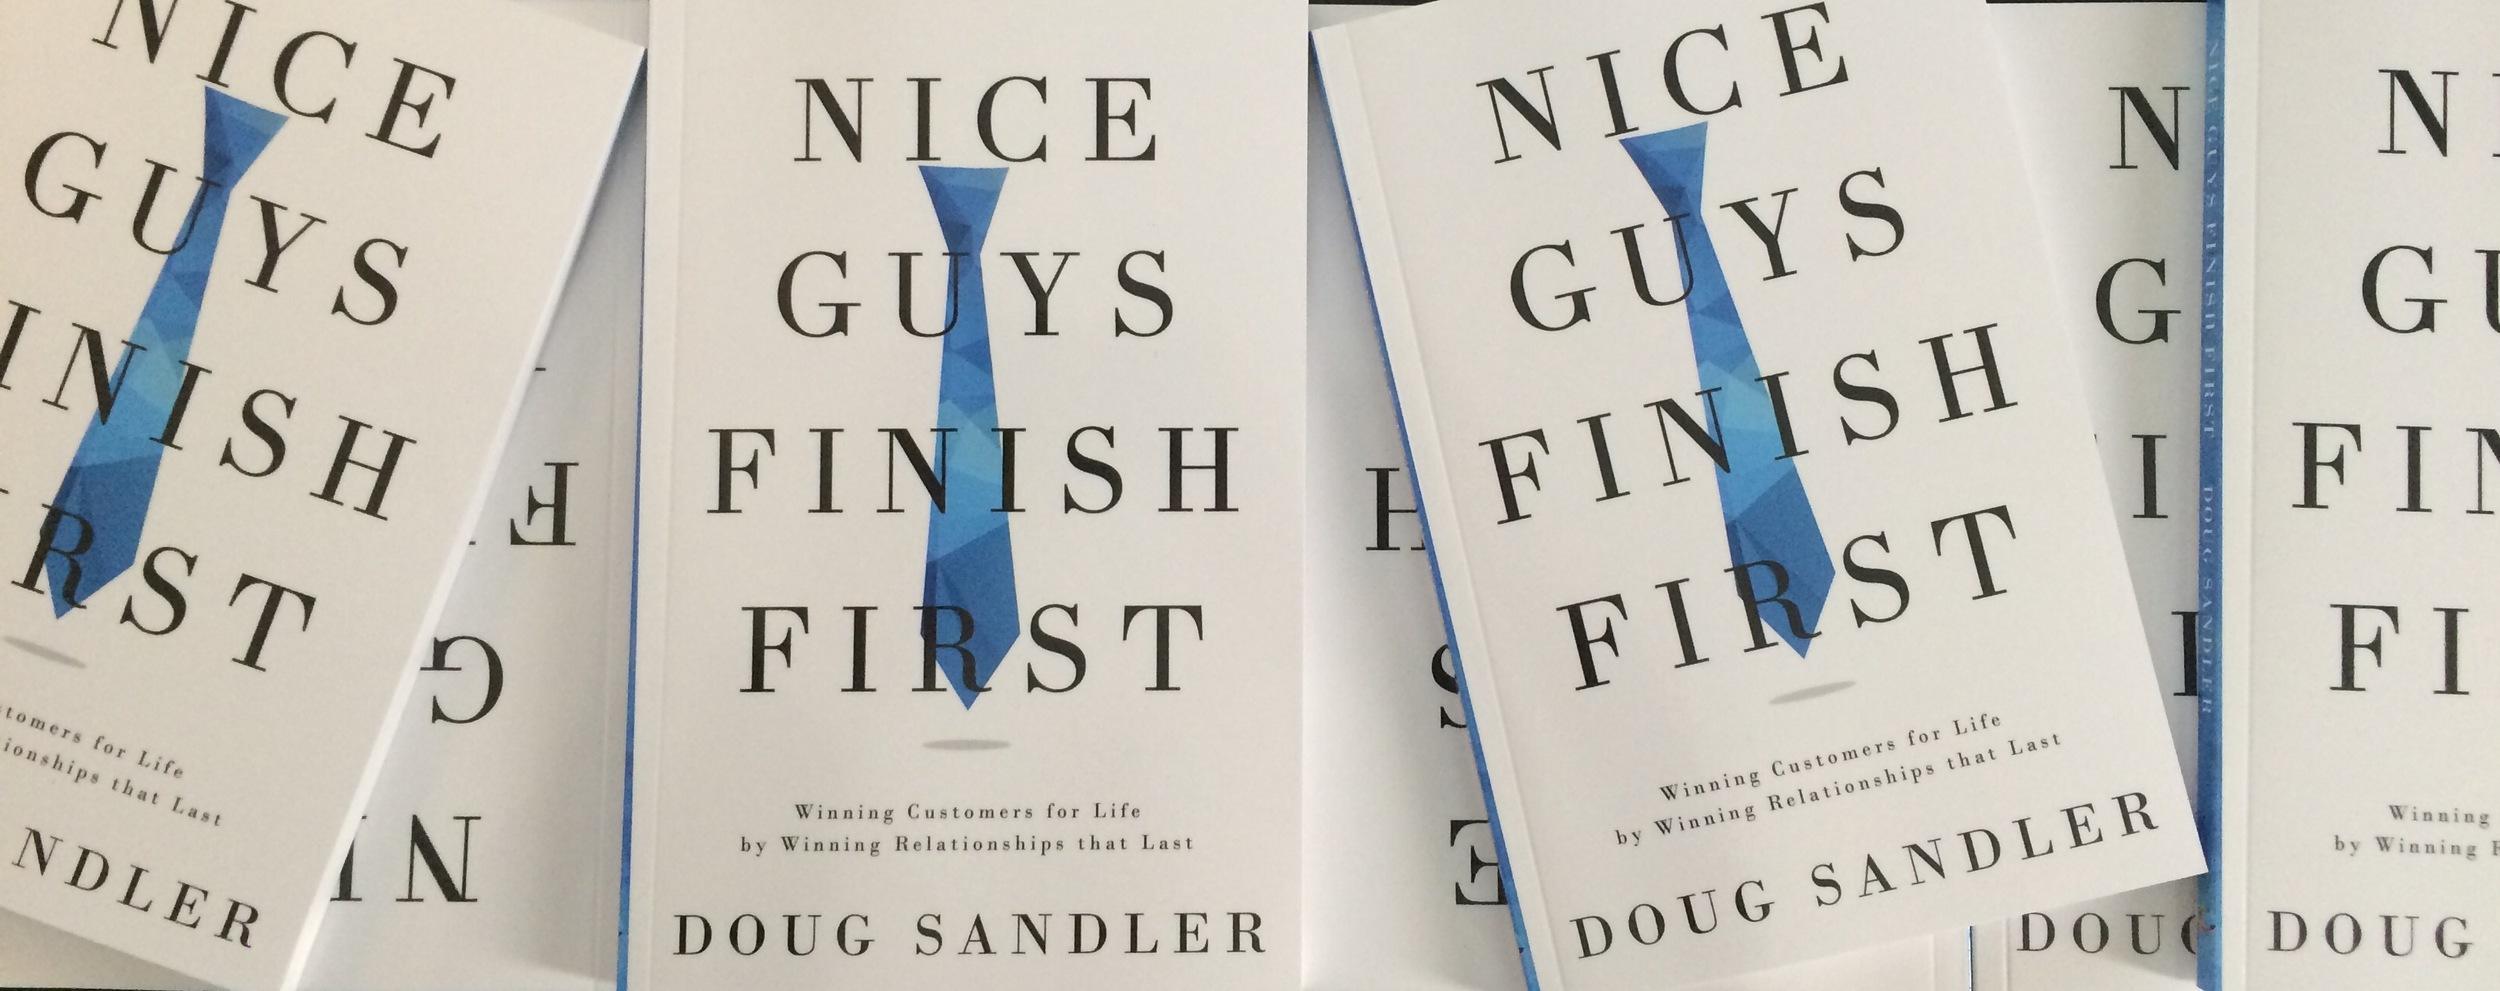 #1 Ranked Amazon Best Seller